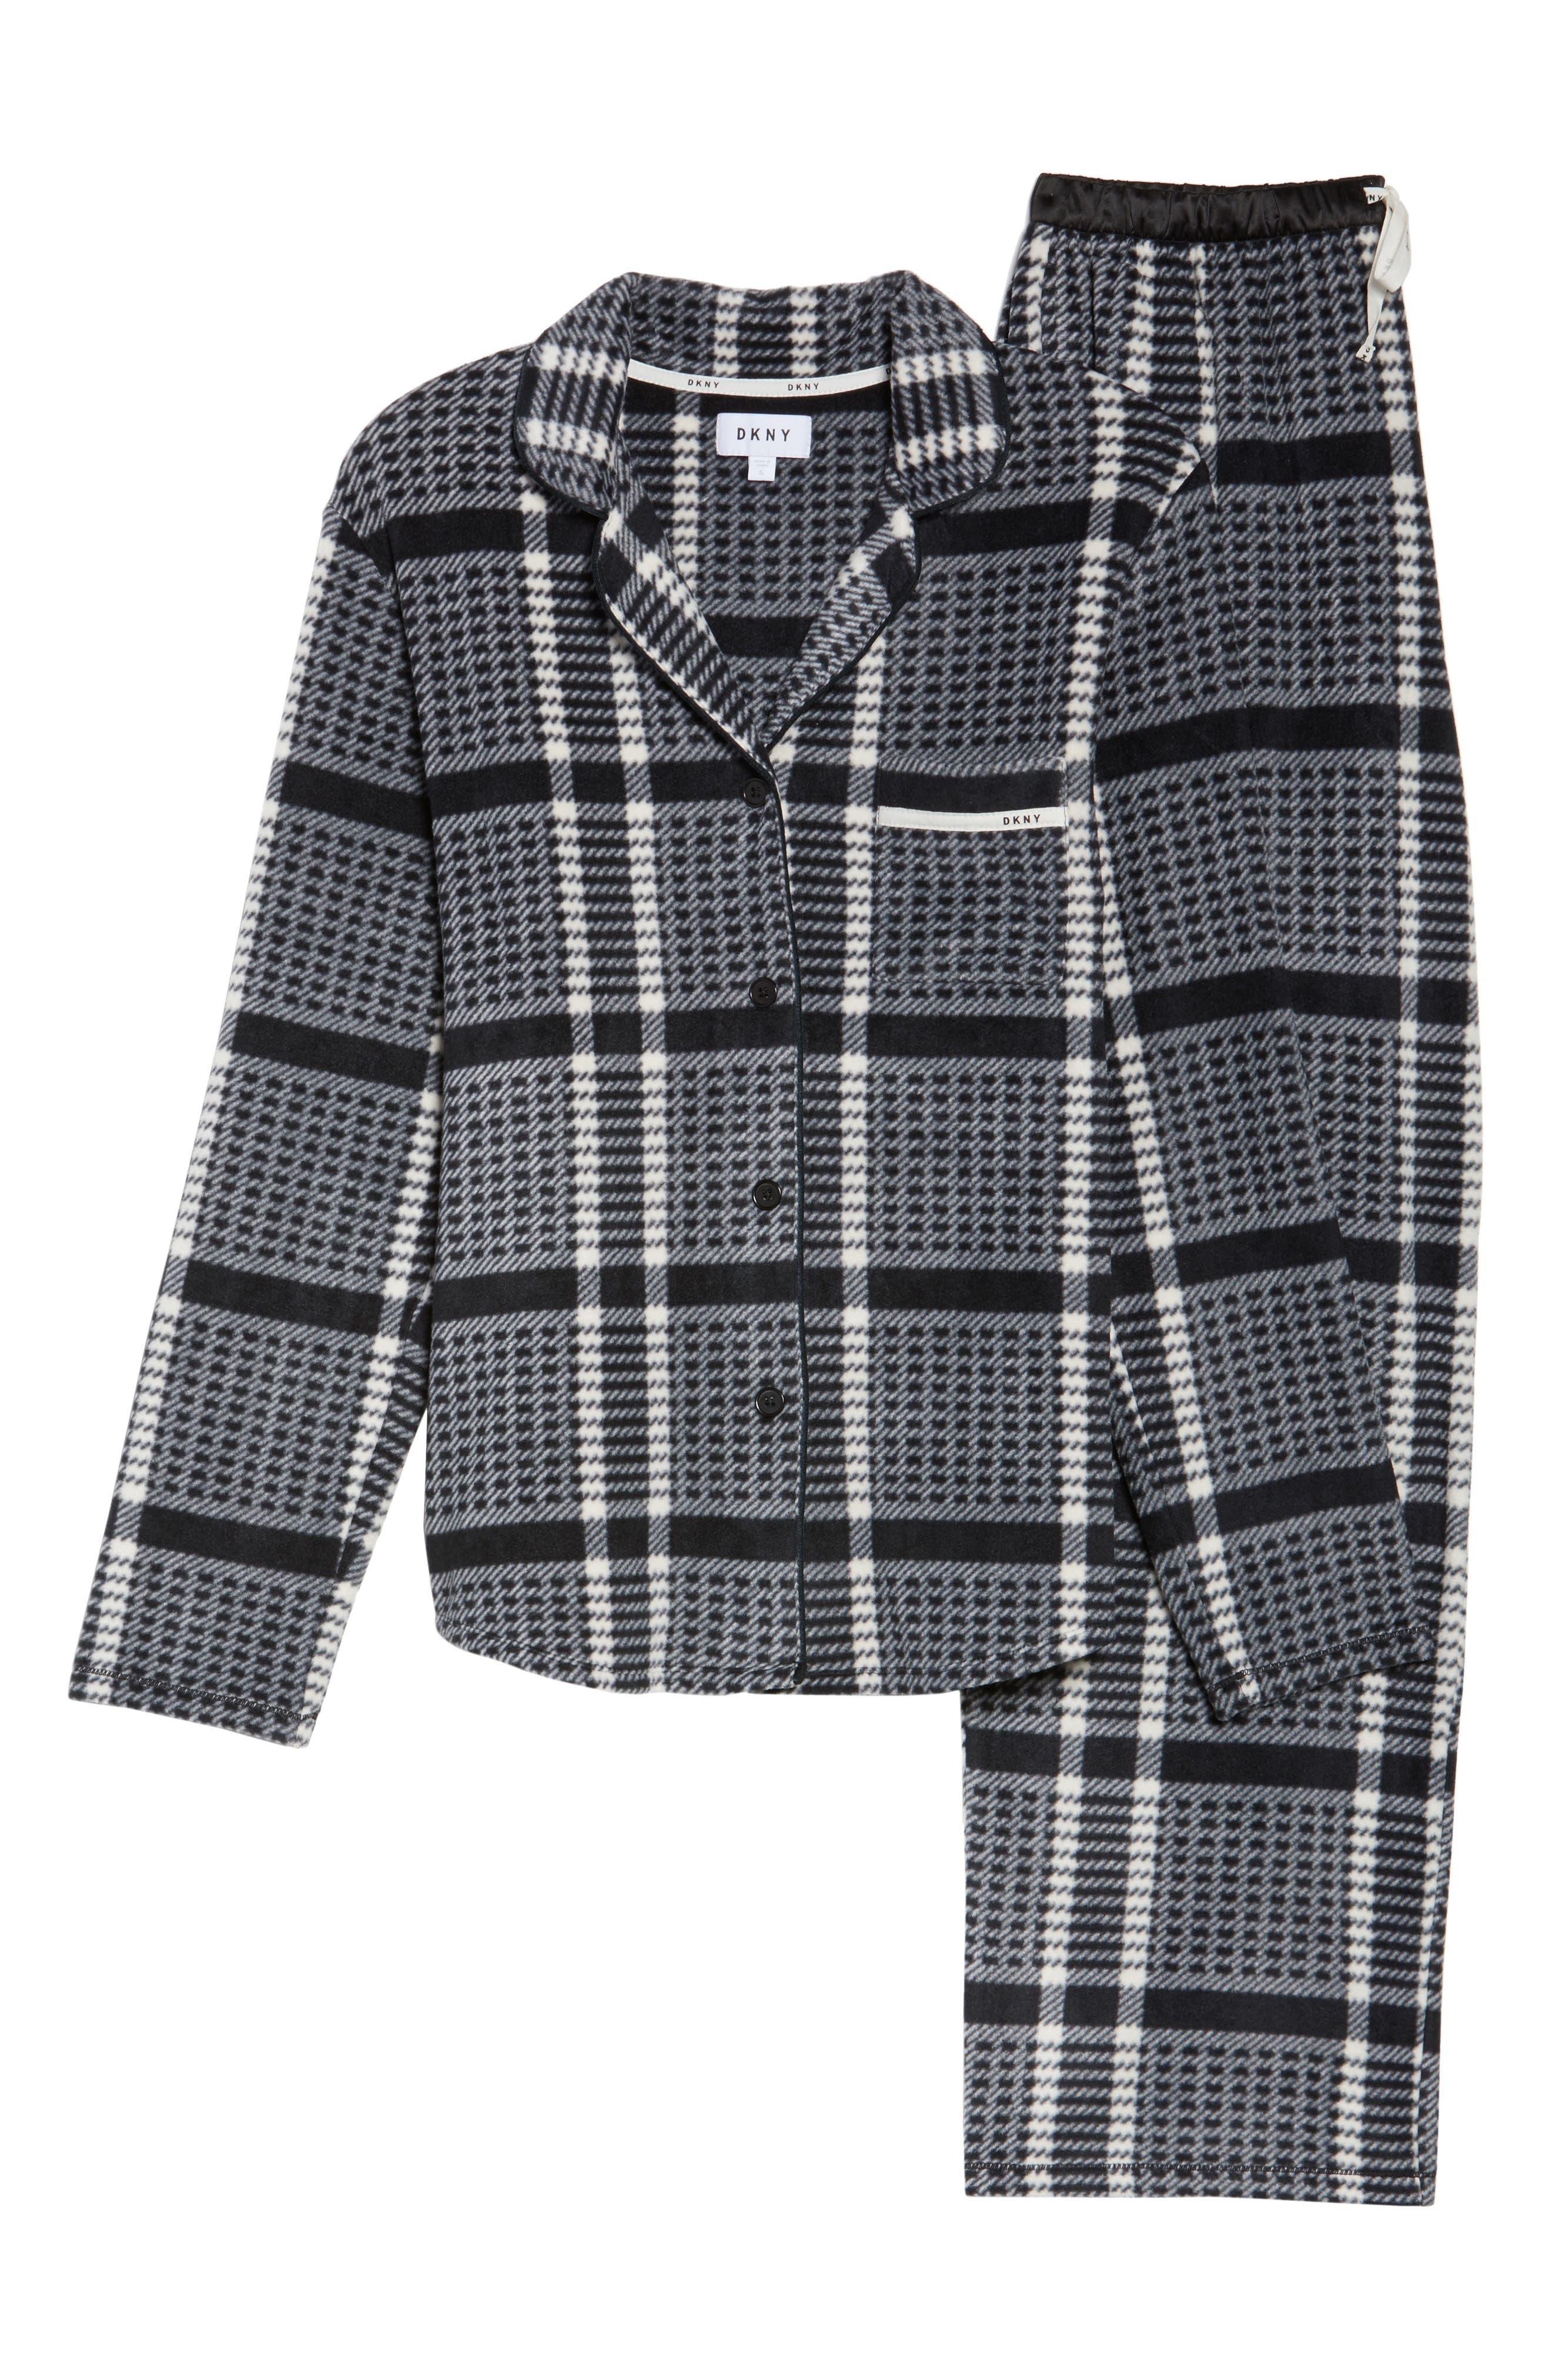 Stretch Fleece Long Pajamas,                             Alternate thumbnail 6, color,                             005